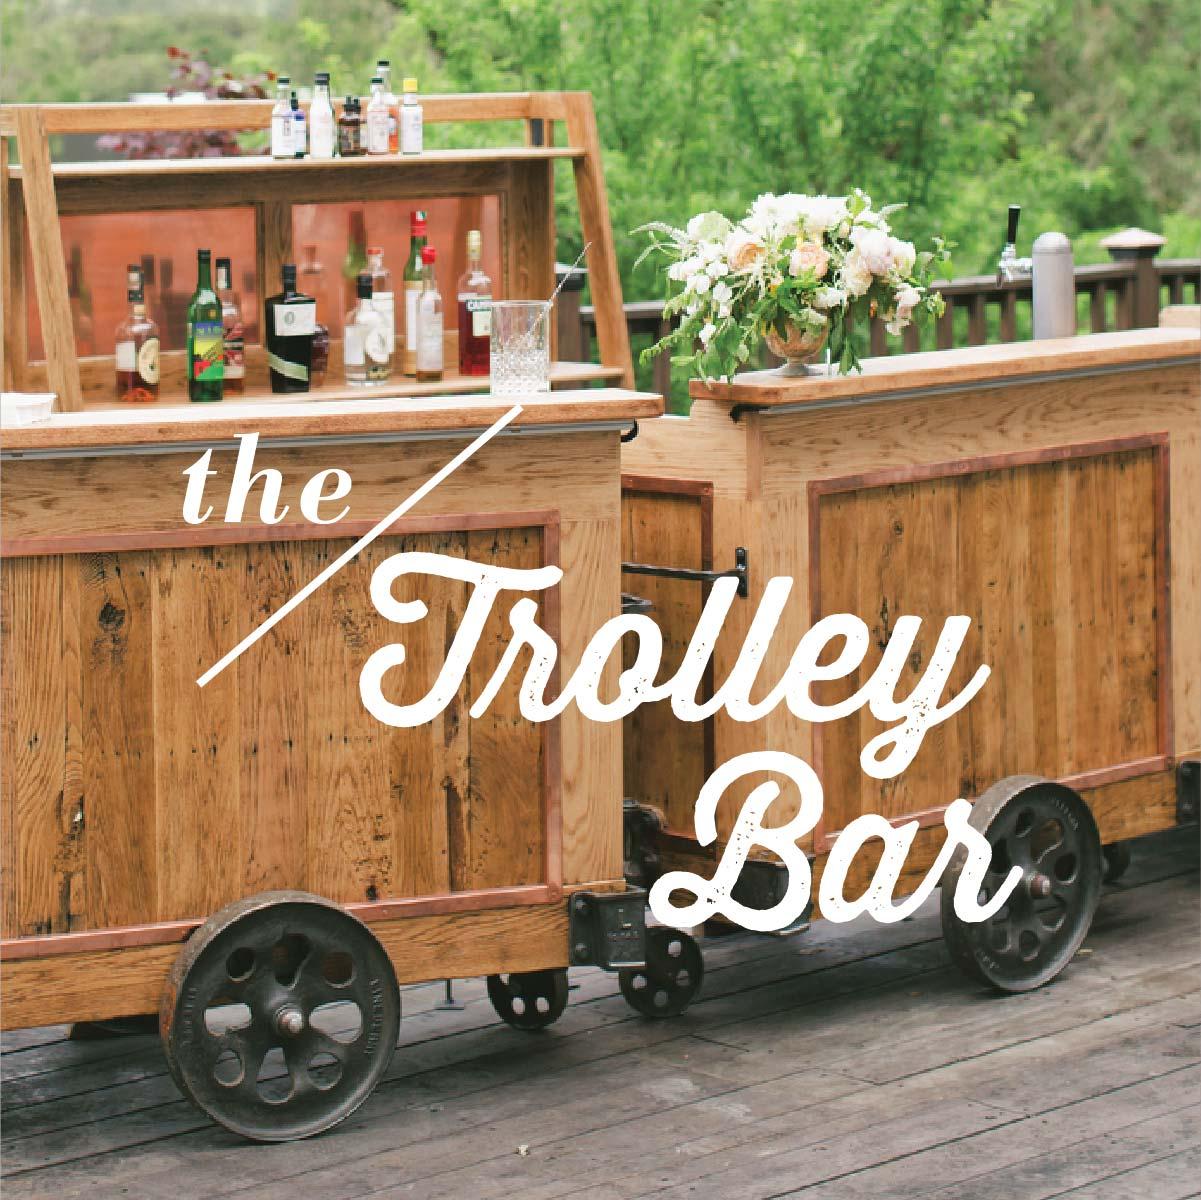 about_thumbnails-trolleybar.jpg